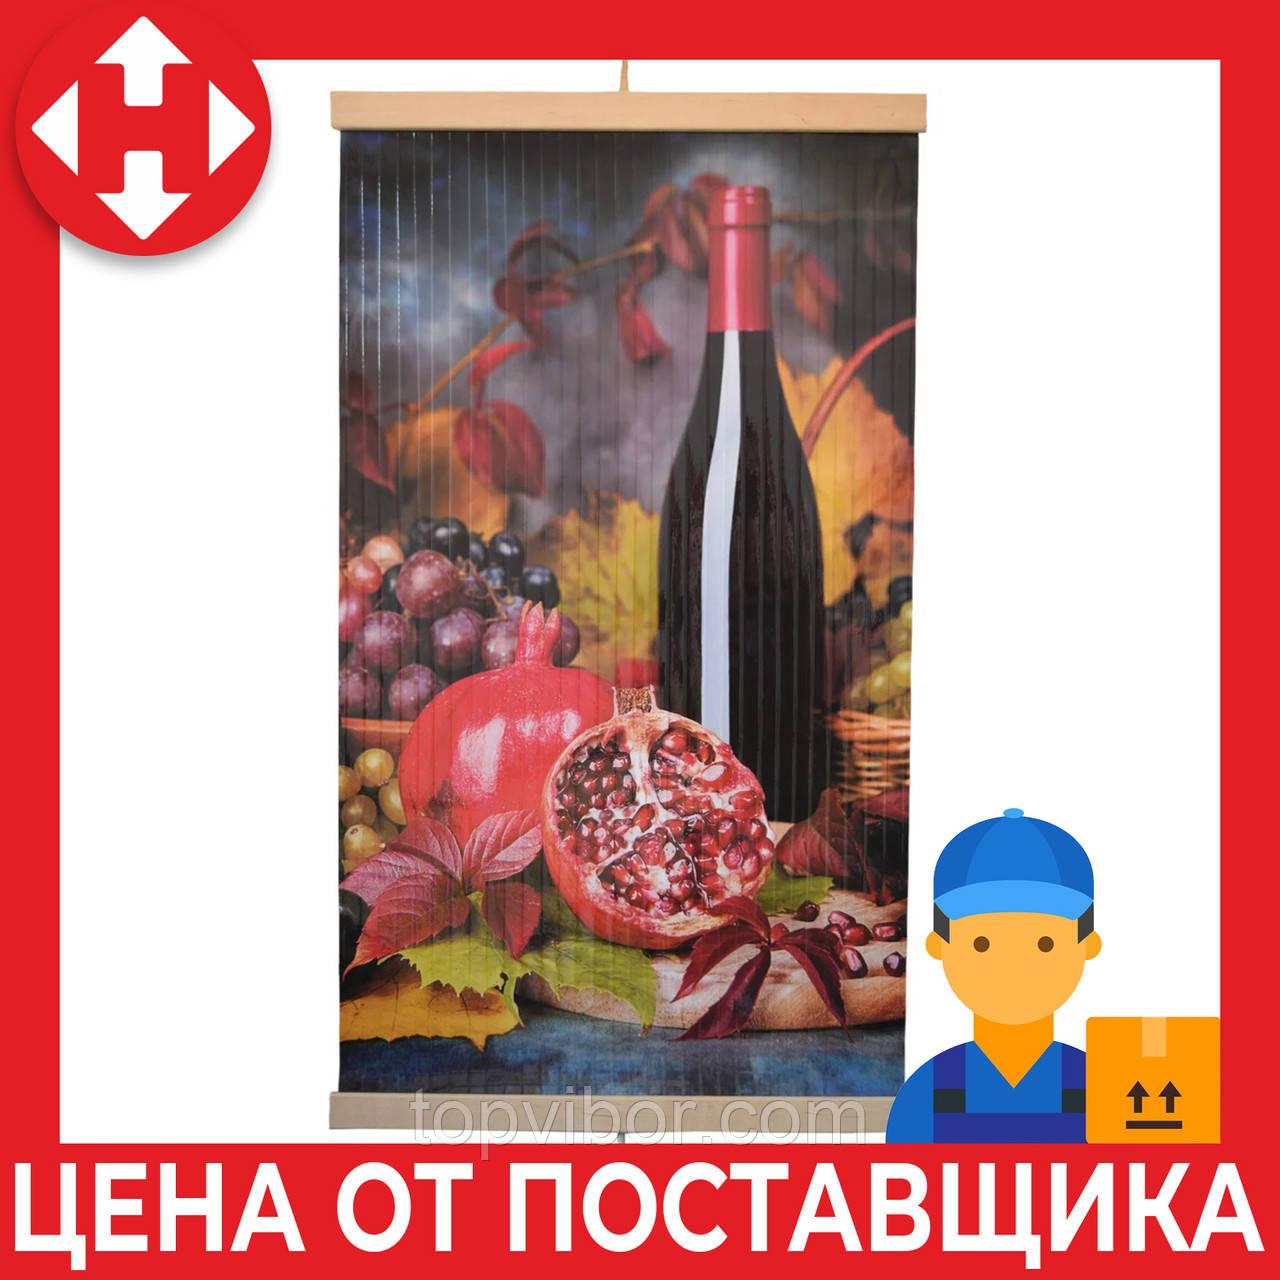 Электрообогреватель картина обогреватель электрический (Натюрморт) электрообогреватель Трио 00112